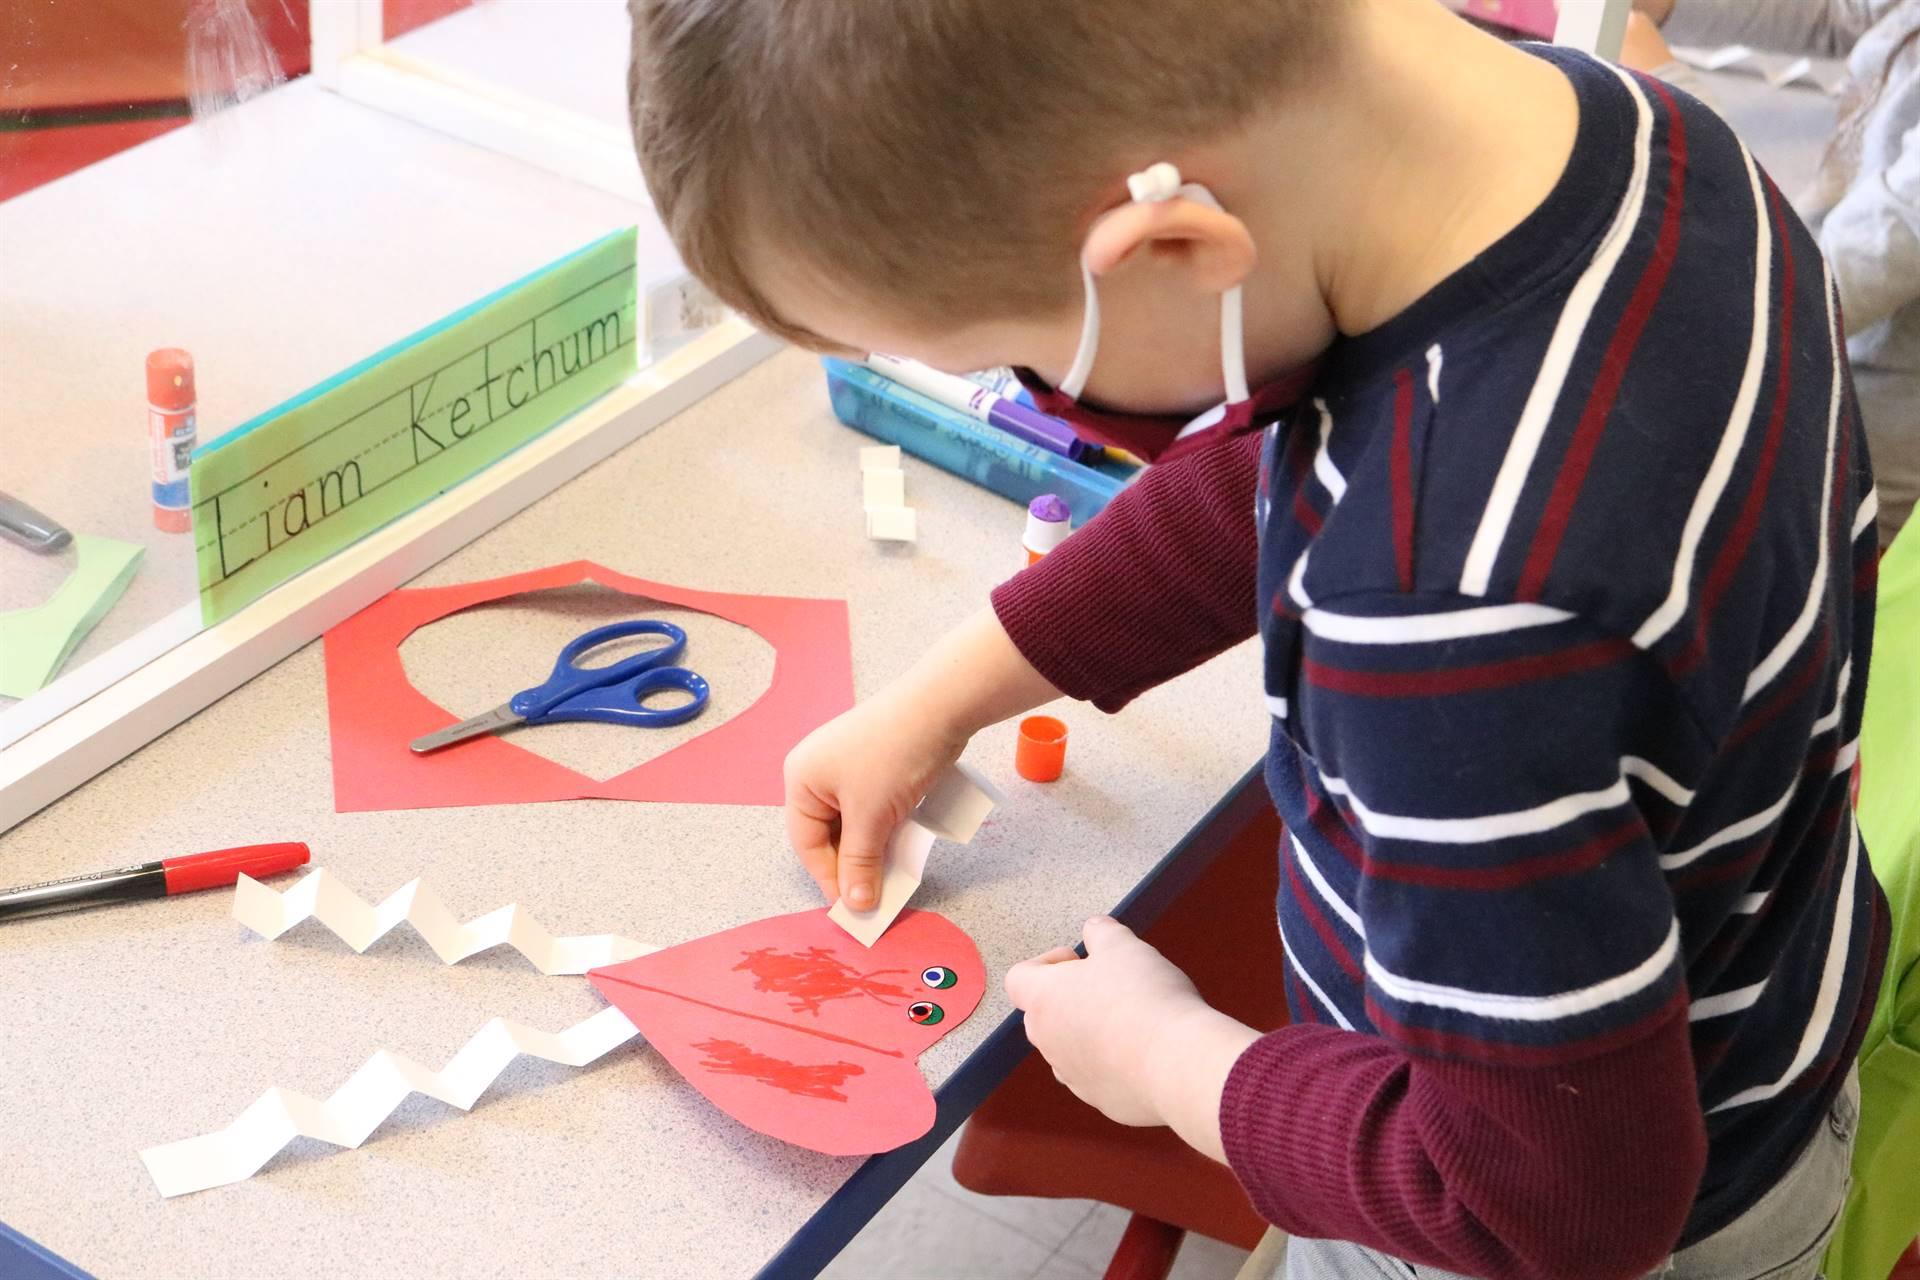 boy gluing to a paper heart